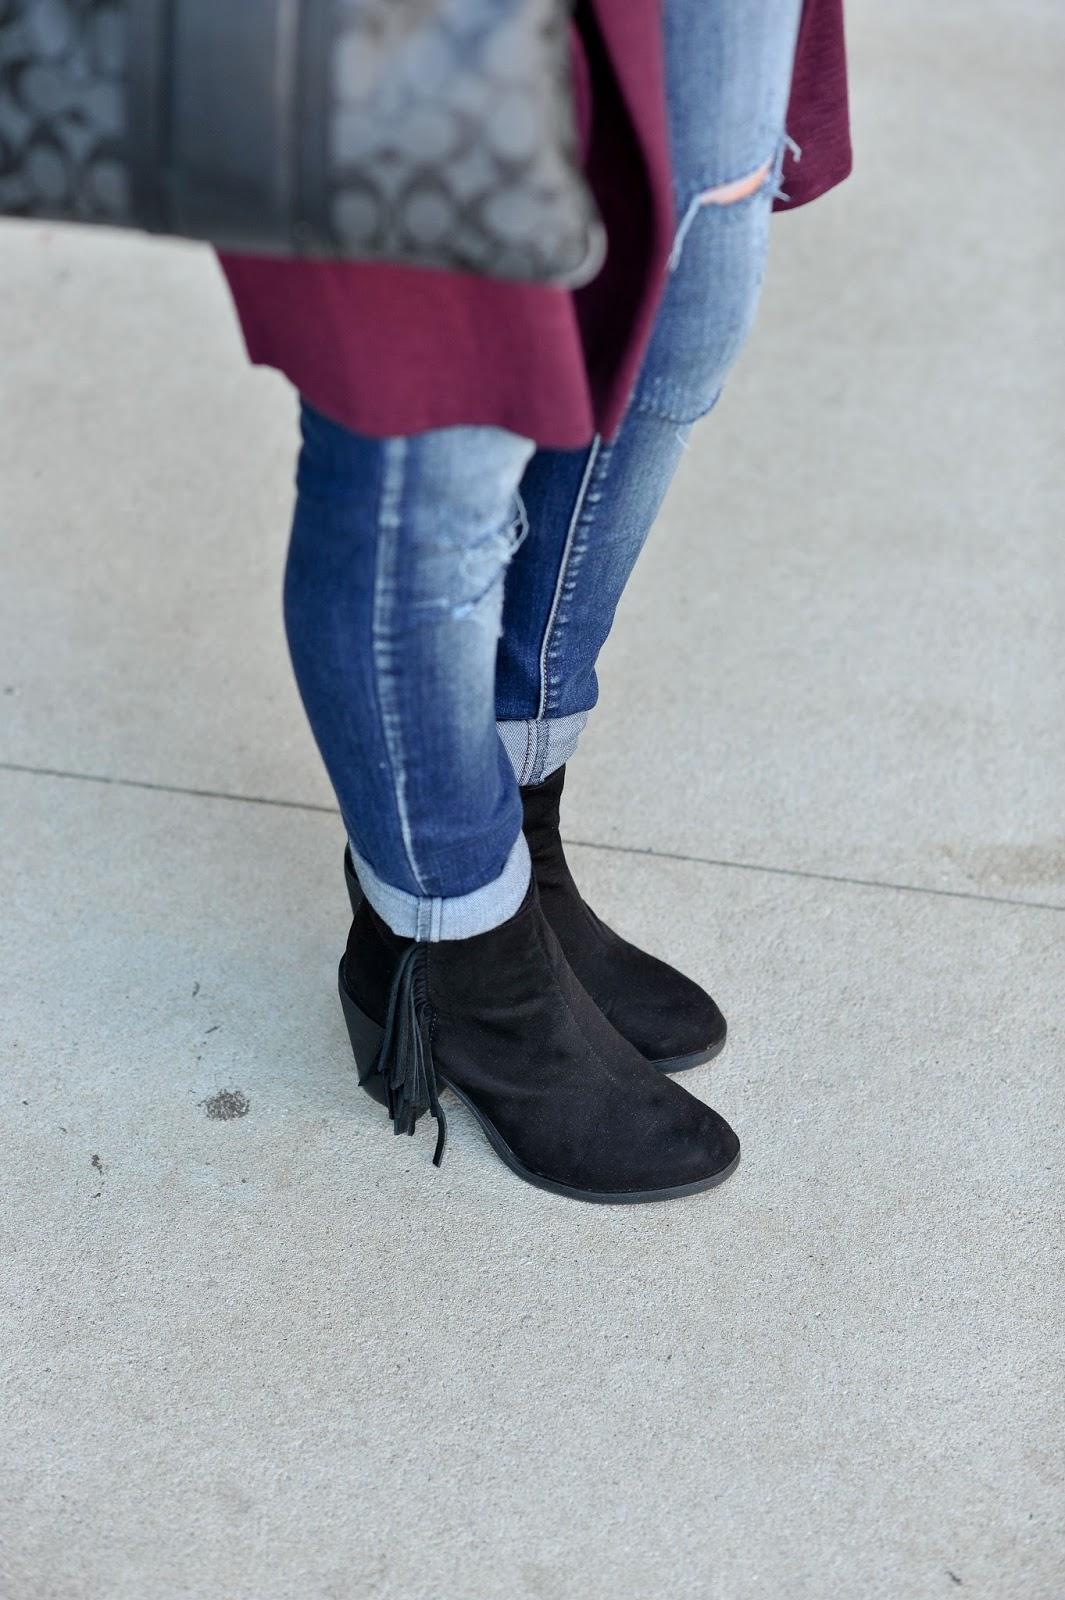 H&M Black Fringe Booties